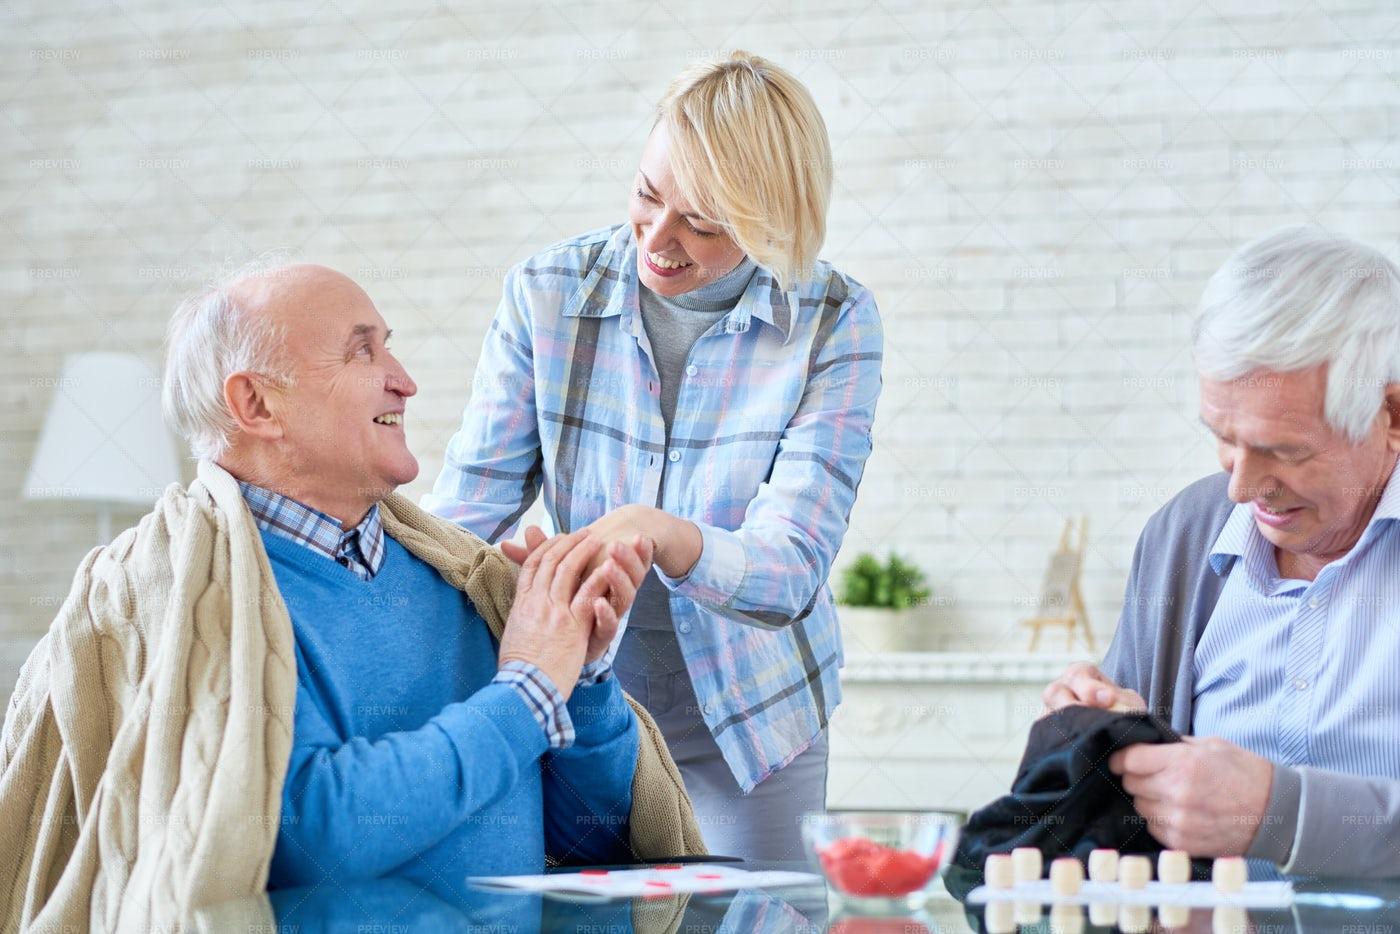 Seniors In Retirement Home: Stock Photos